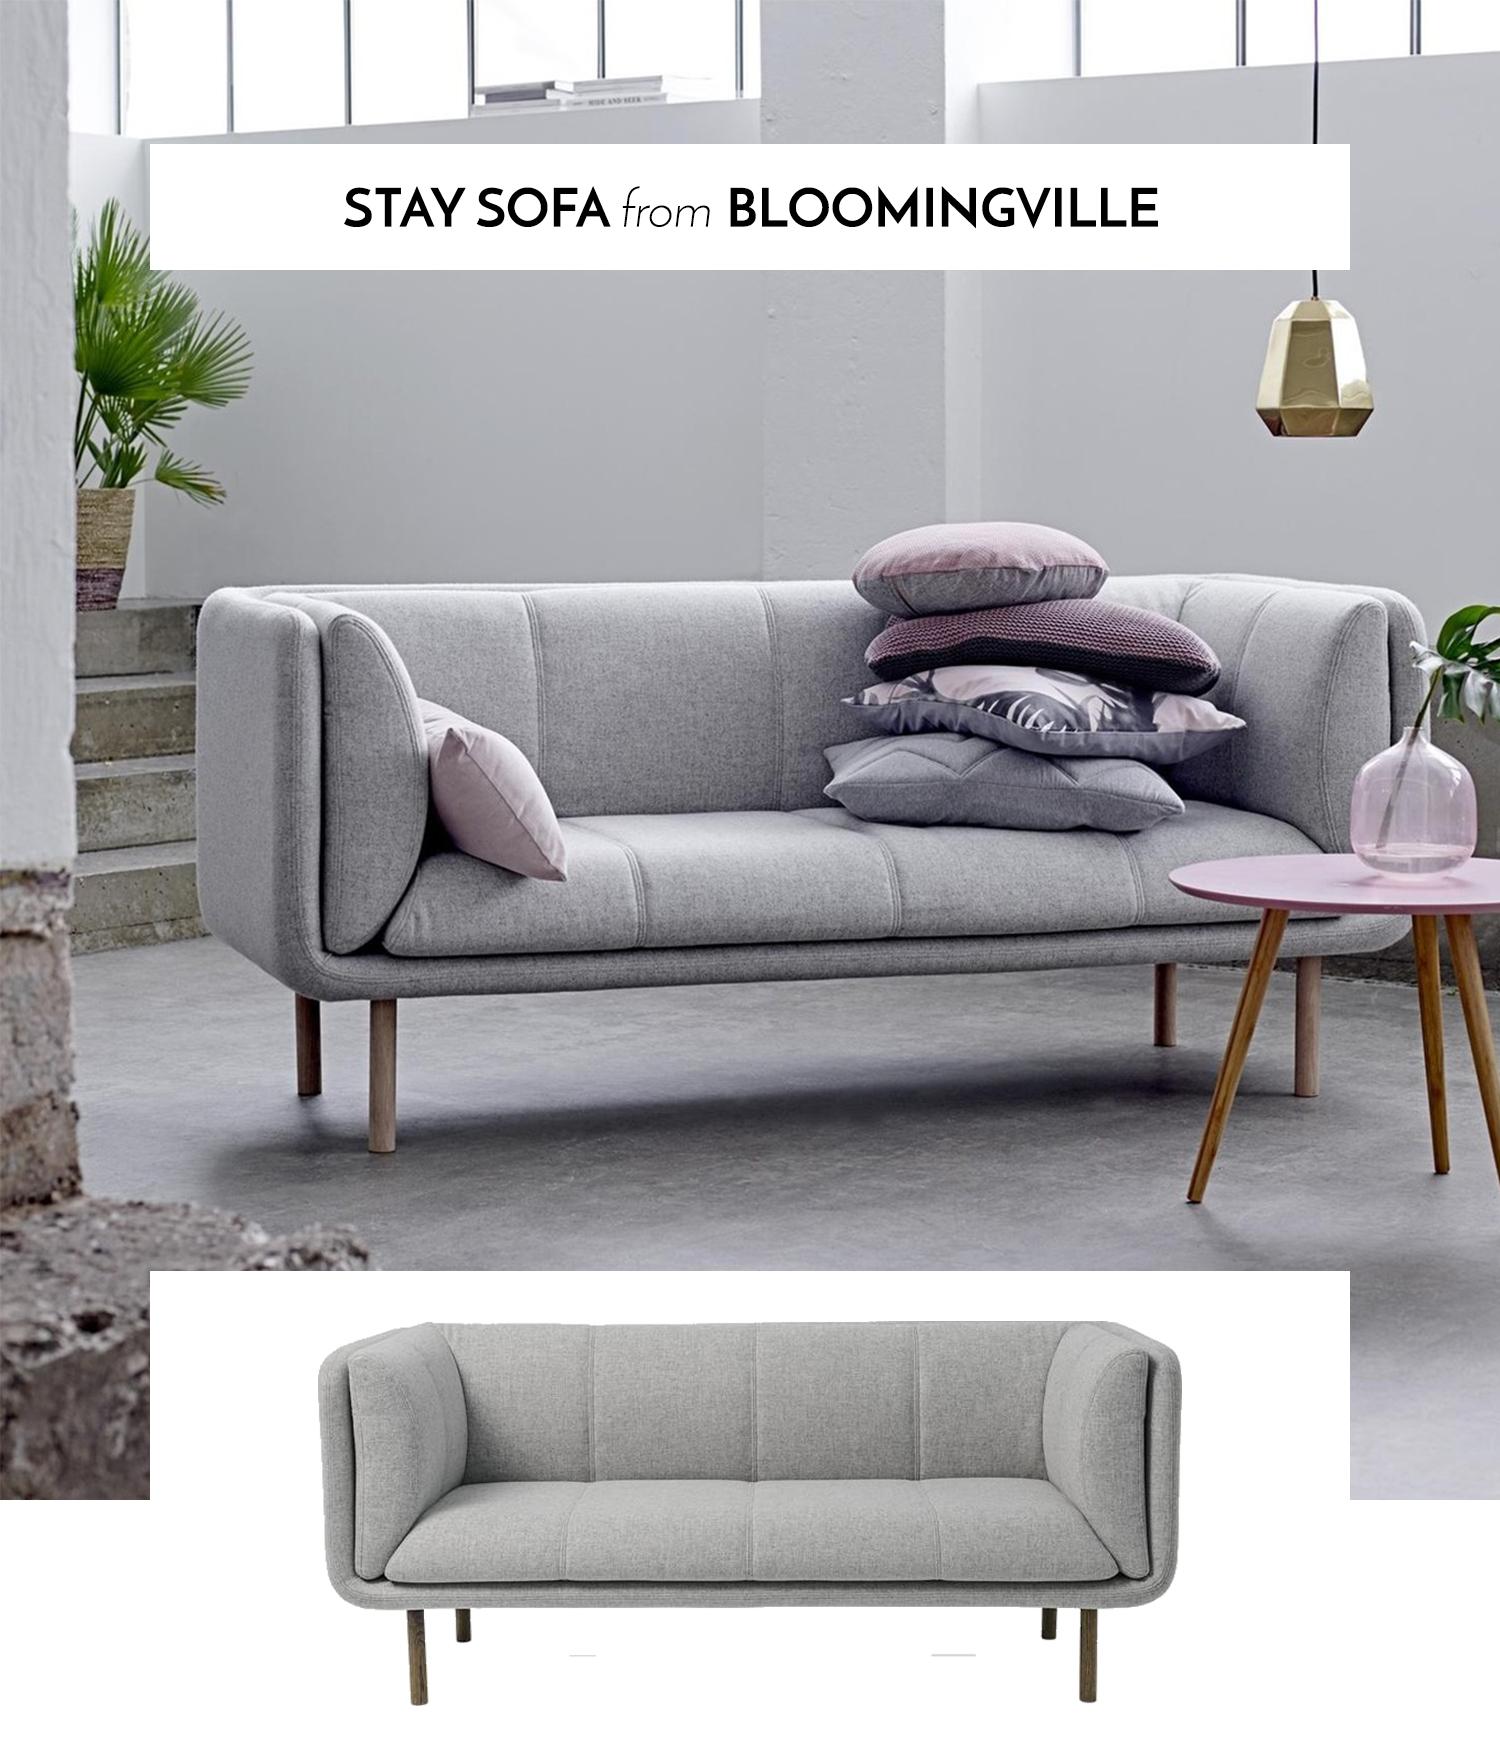 stay_sofa_bloomingville